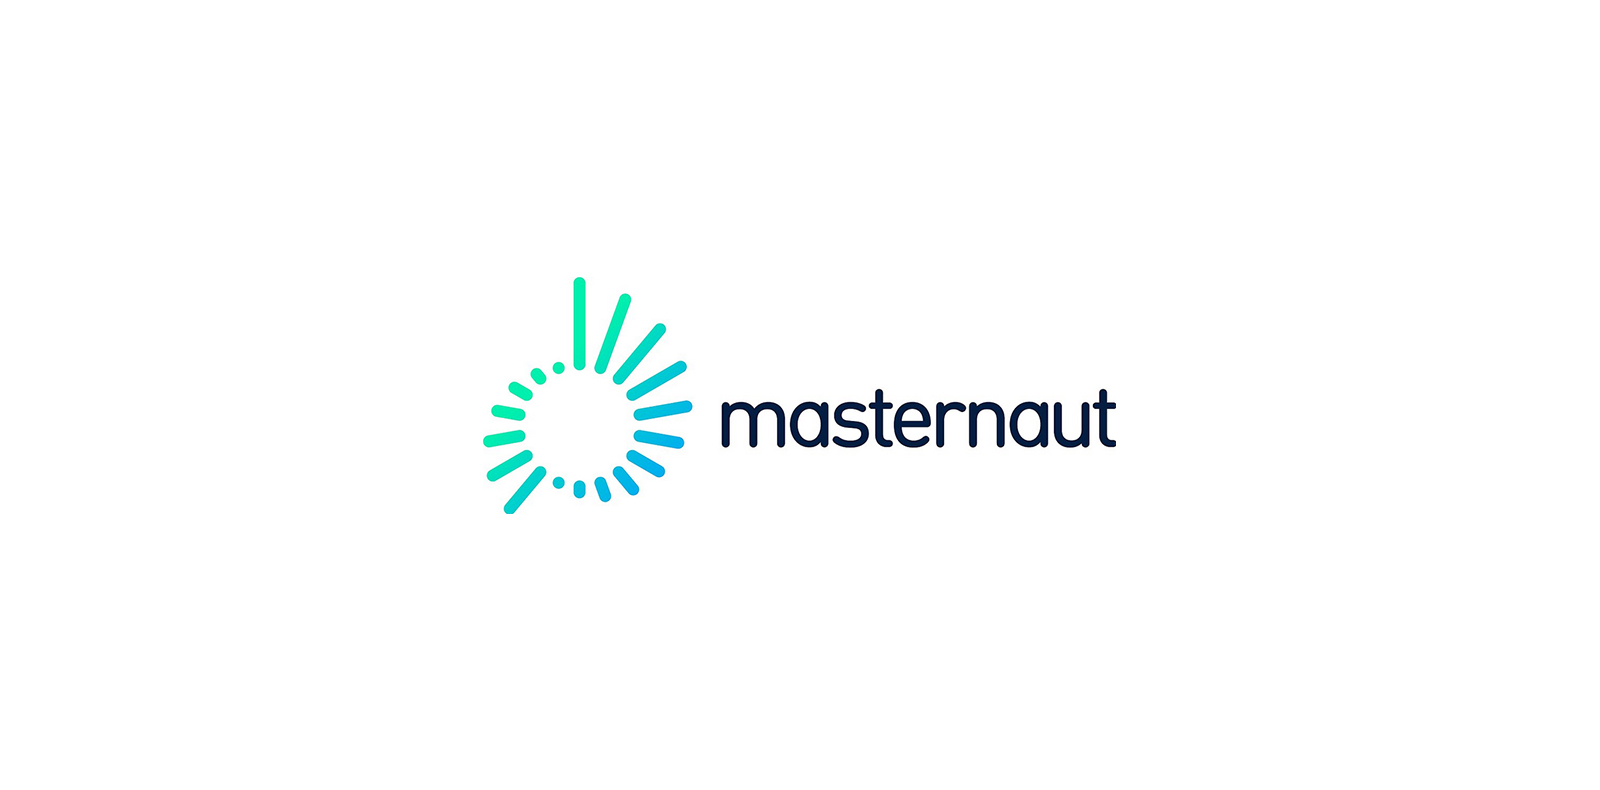 cp_masternaut_1600x790